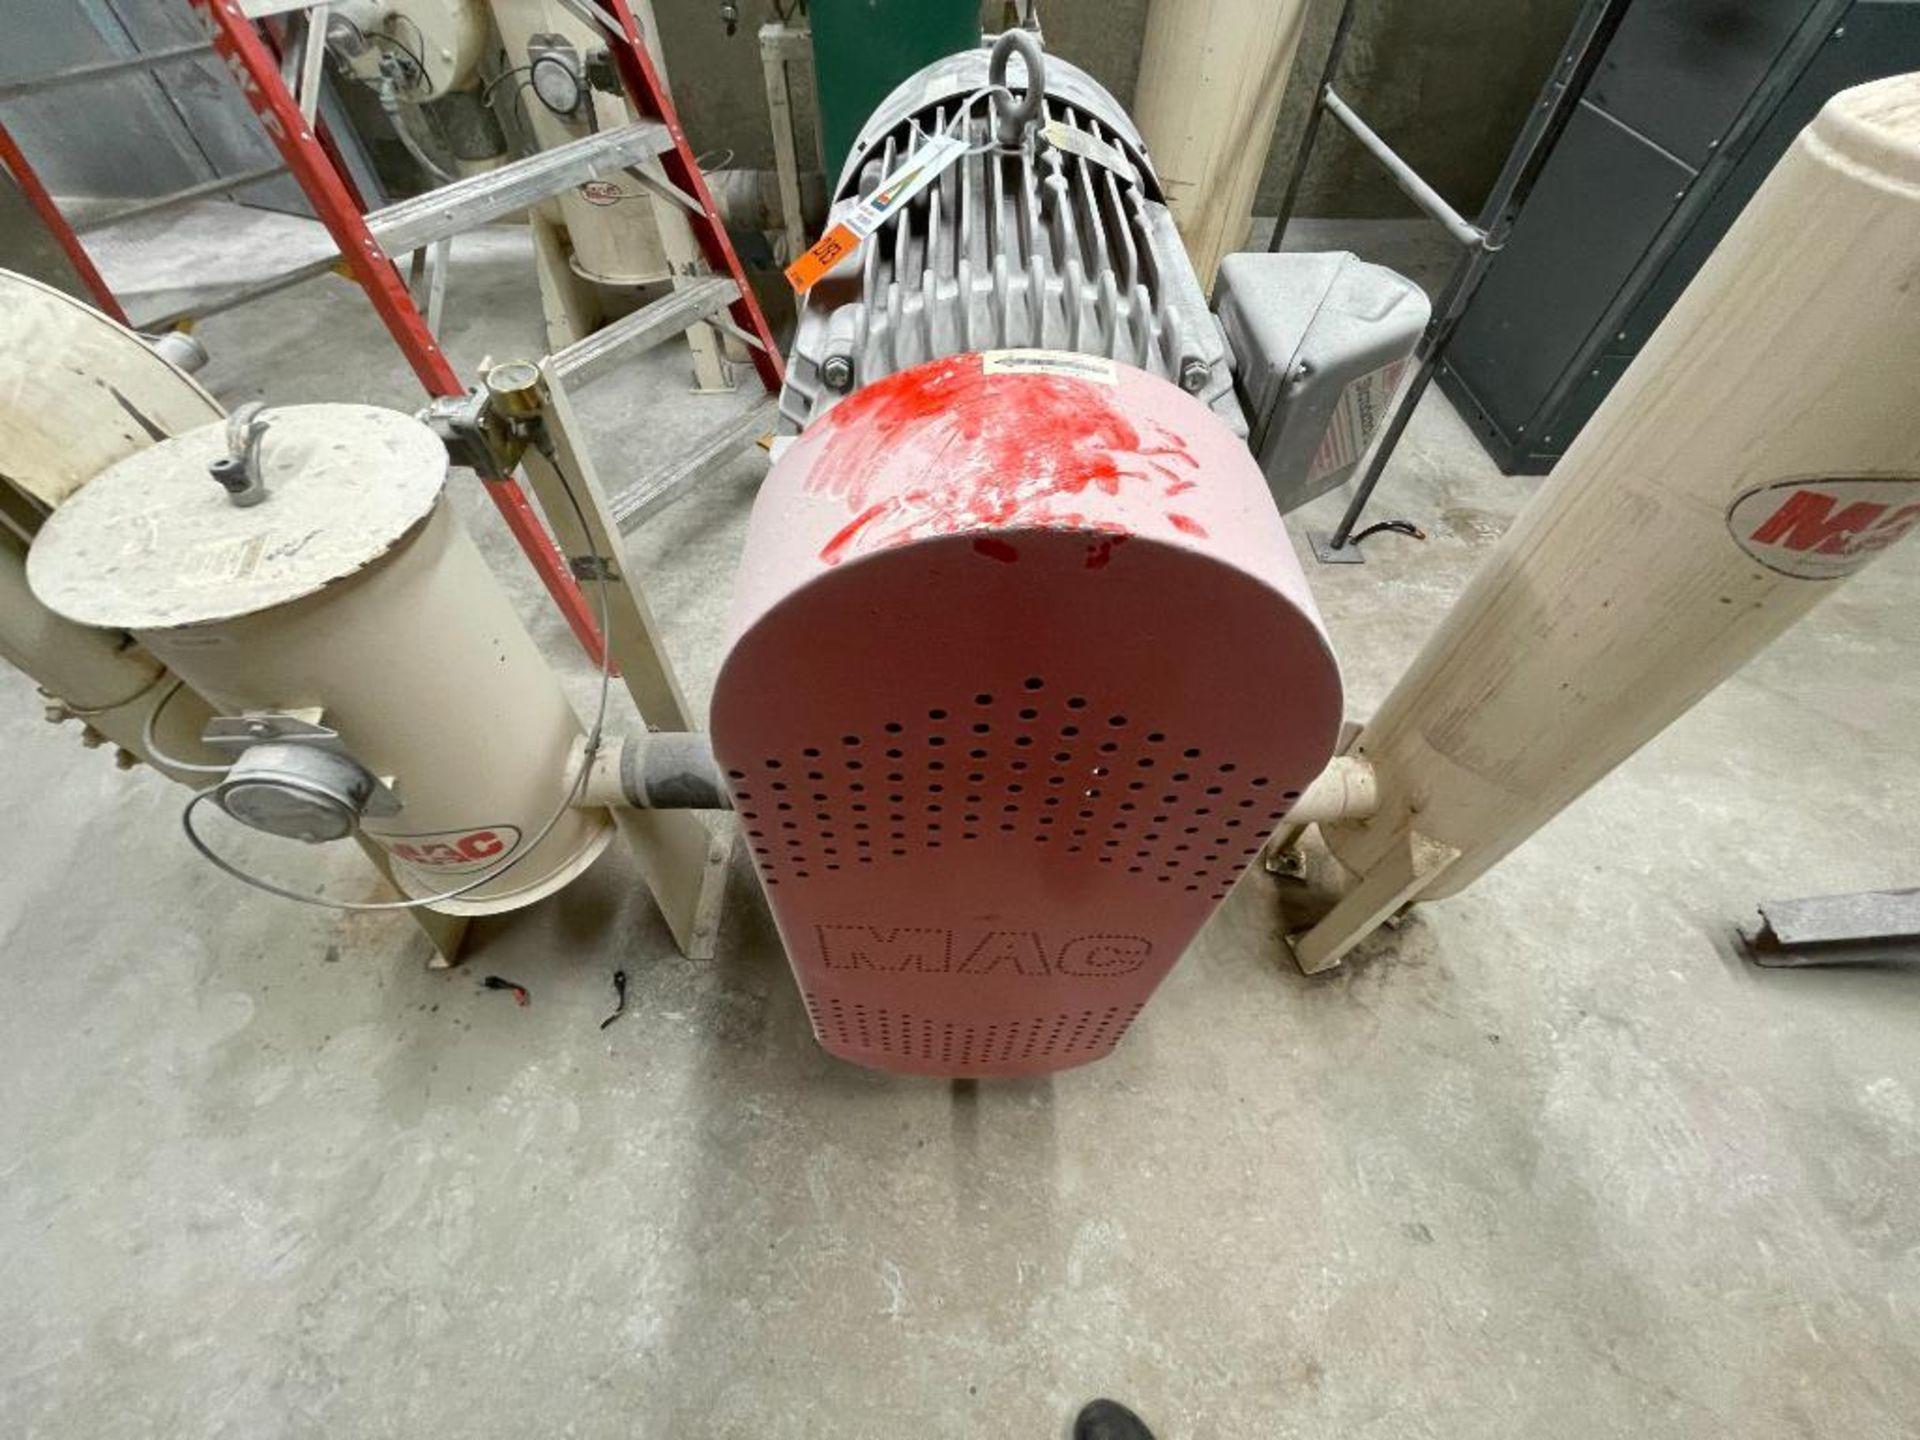 Sutorbilt rotary positive blower - Image 13 of 21